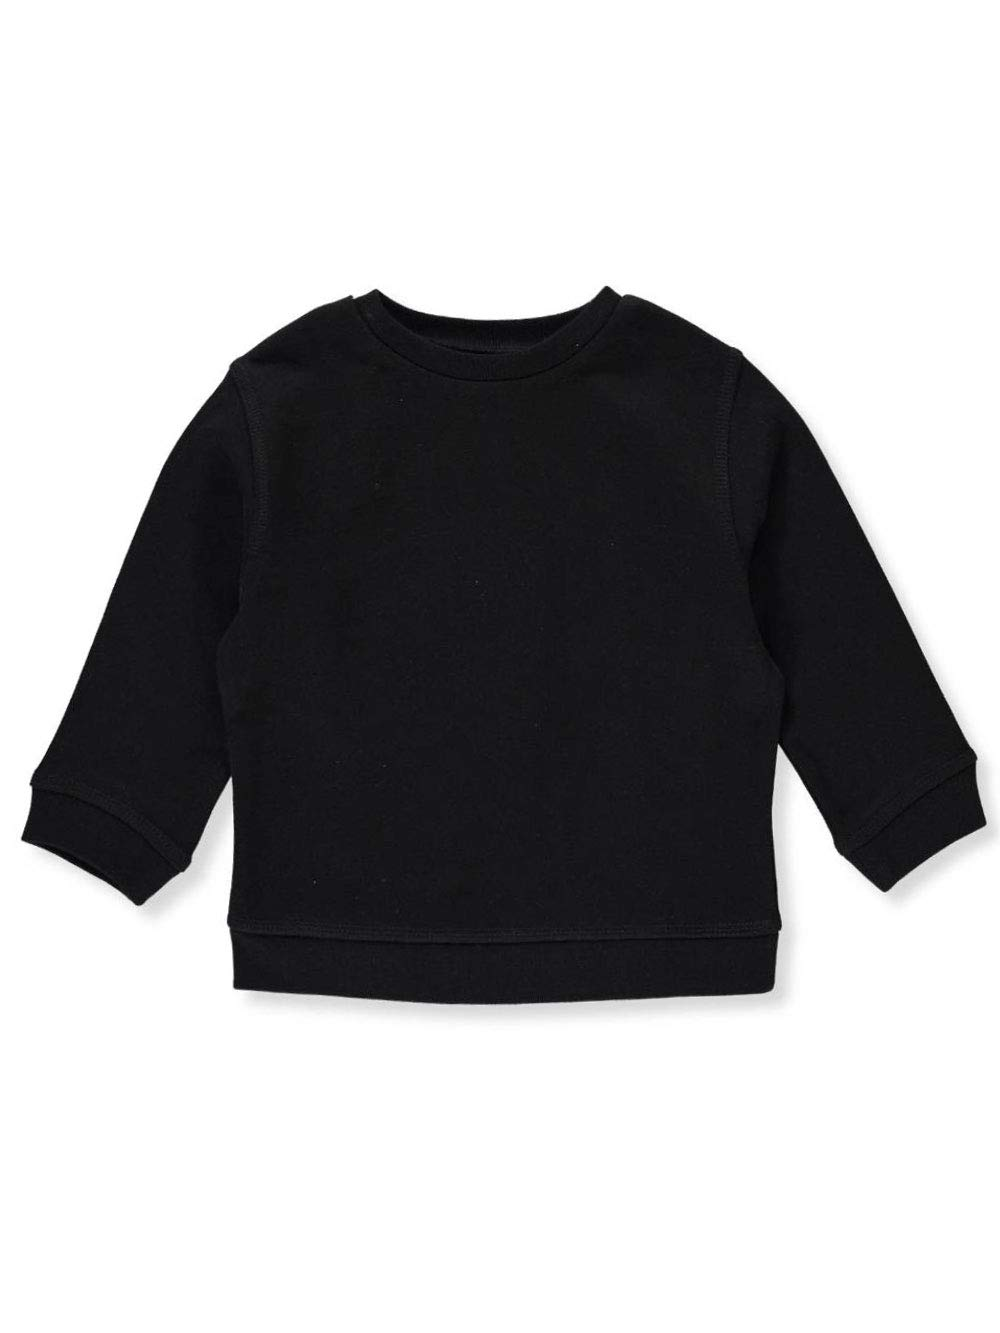 Miniwear Baby Boys' Sweatshirt - red, 24 months